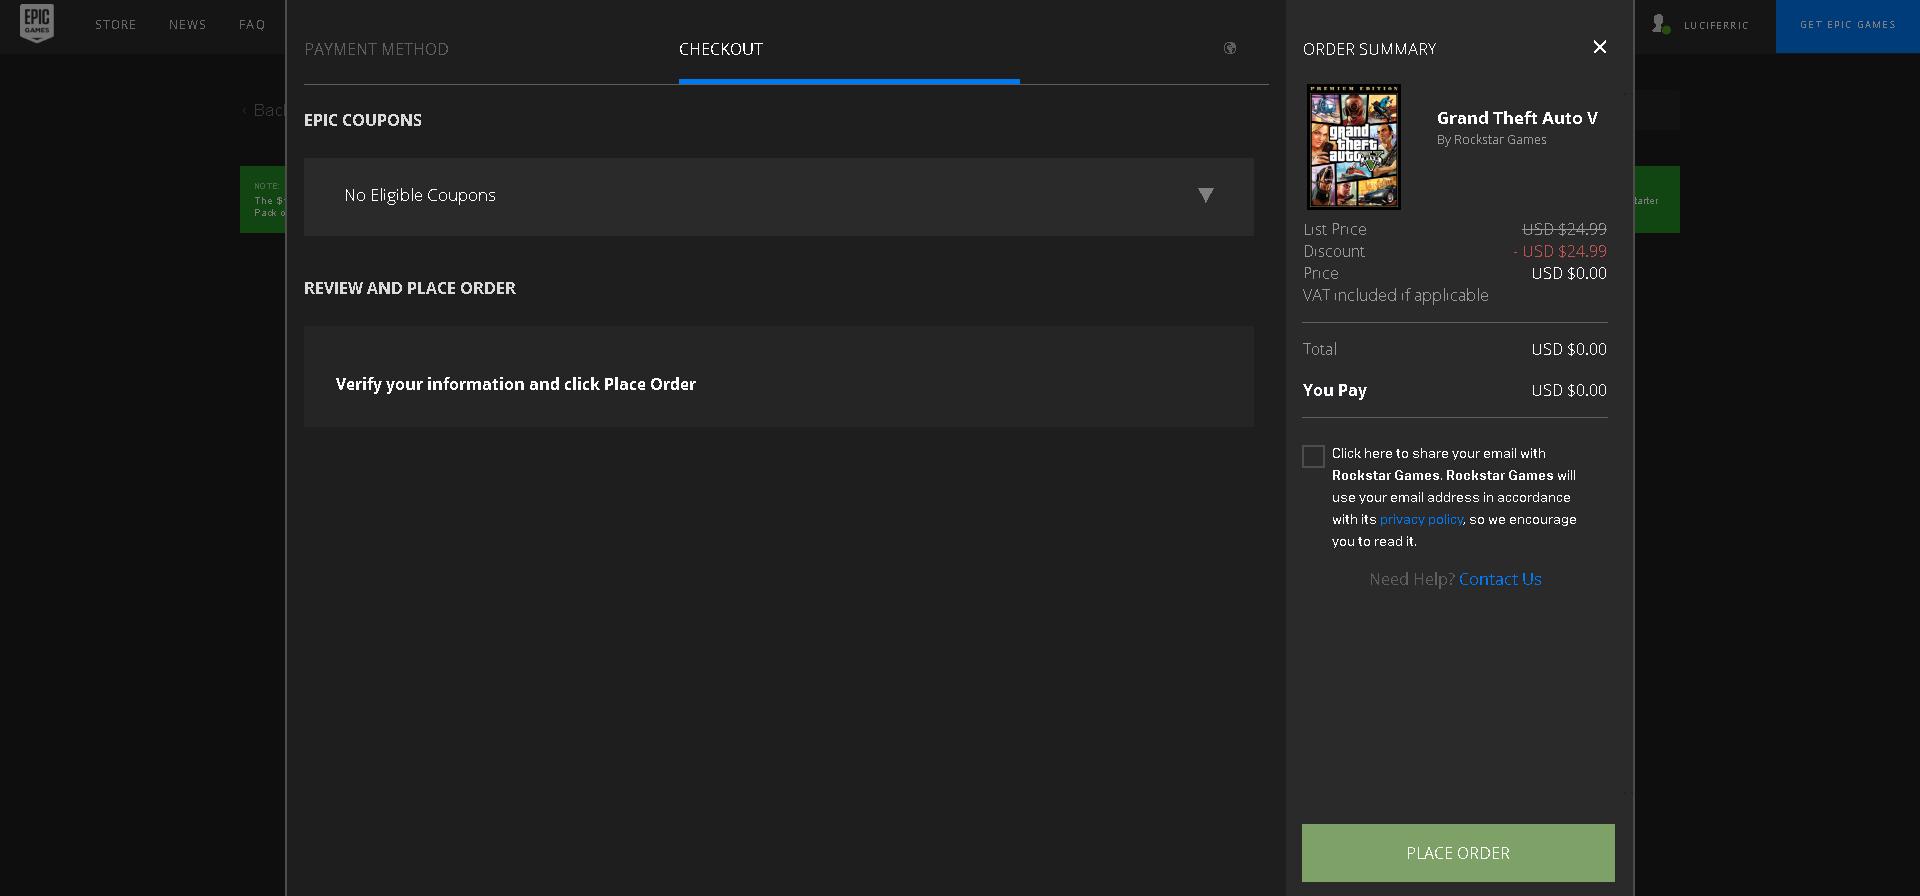 Grand Theft Auto V - Grand Theft Auto V_ Premium Edition